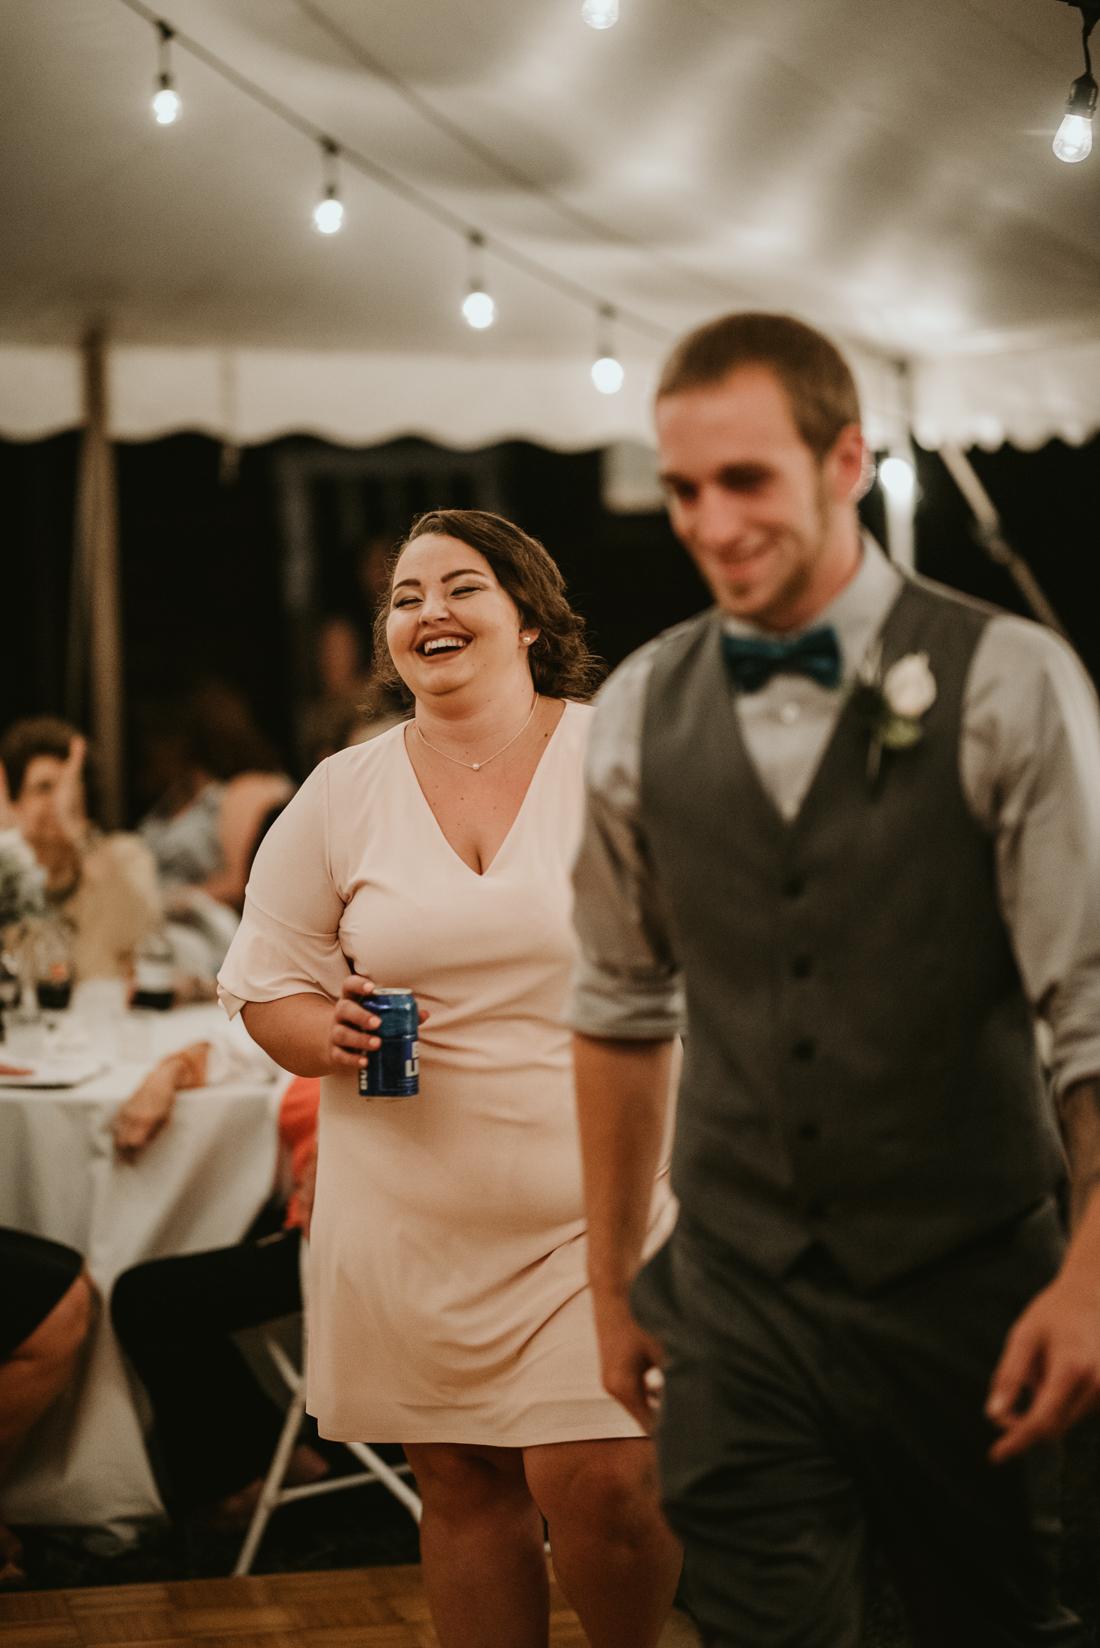 olivia_zay_wedding_09_2018-7808.jpg